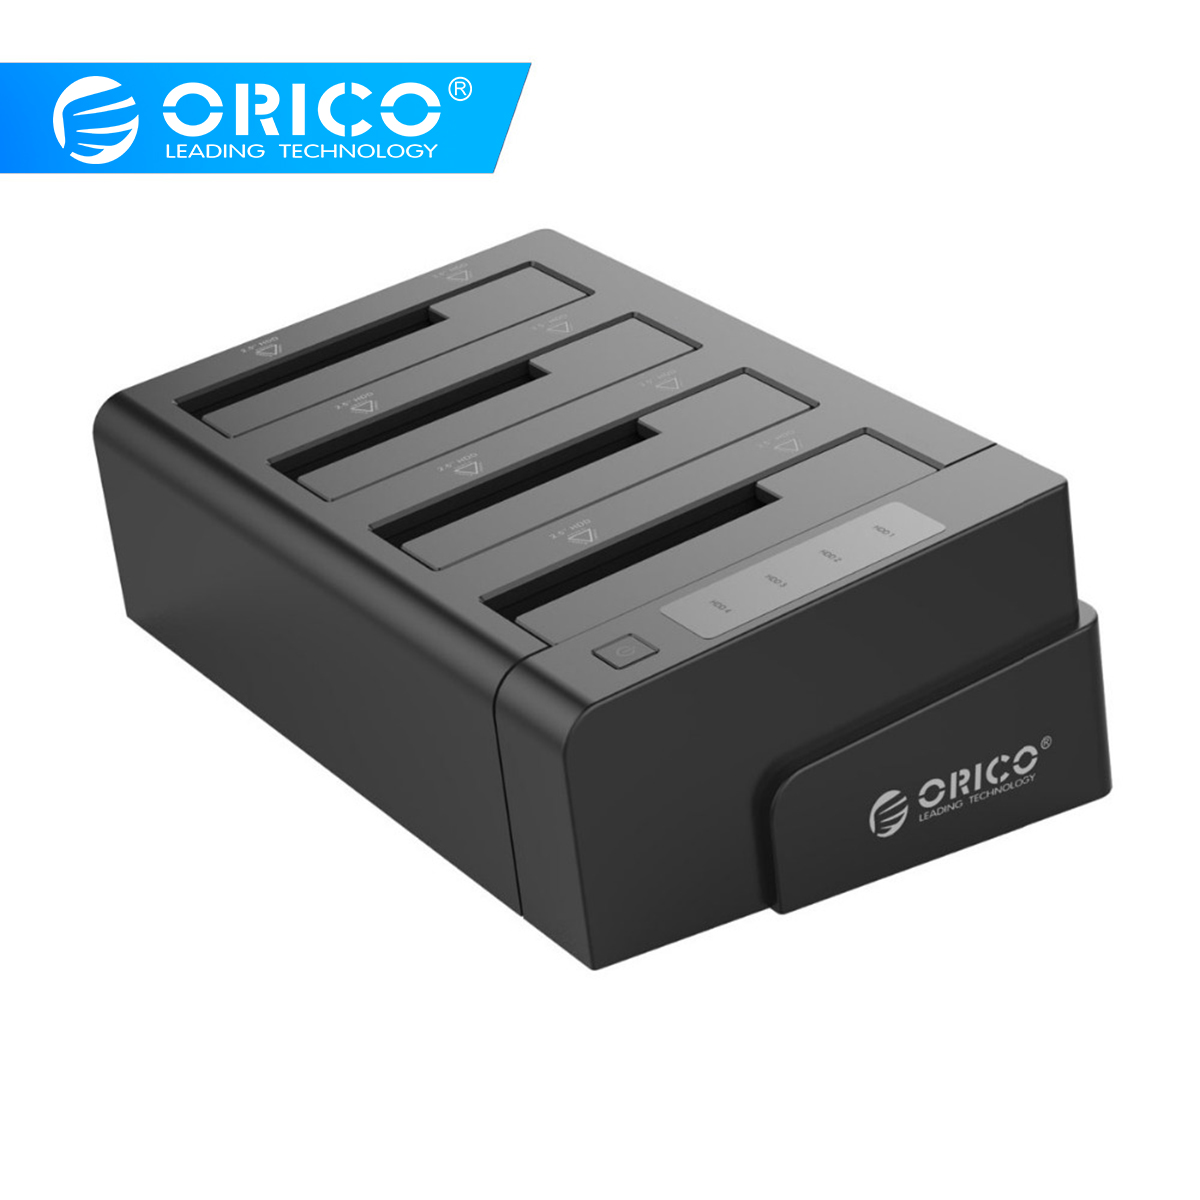 ¡2,5 de 3,5 pulgadas USB 3,0 para disco duro SATA Docking estación/duplicador de apoyo MAX 32 TB con 12V6! 5A adaptador de corriente (ORICO 6648US3-C)